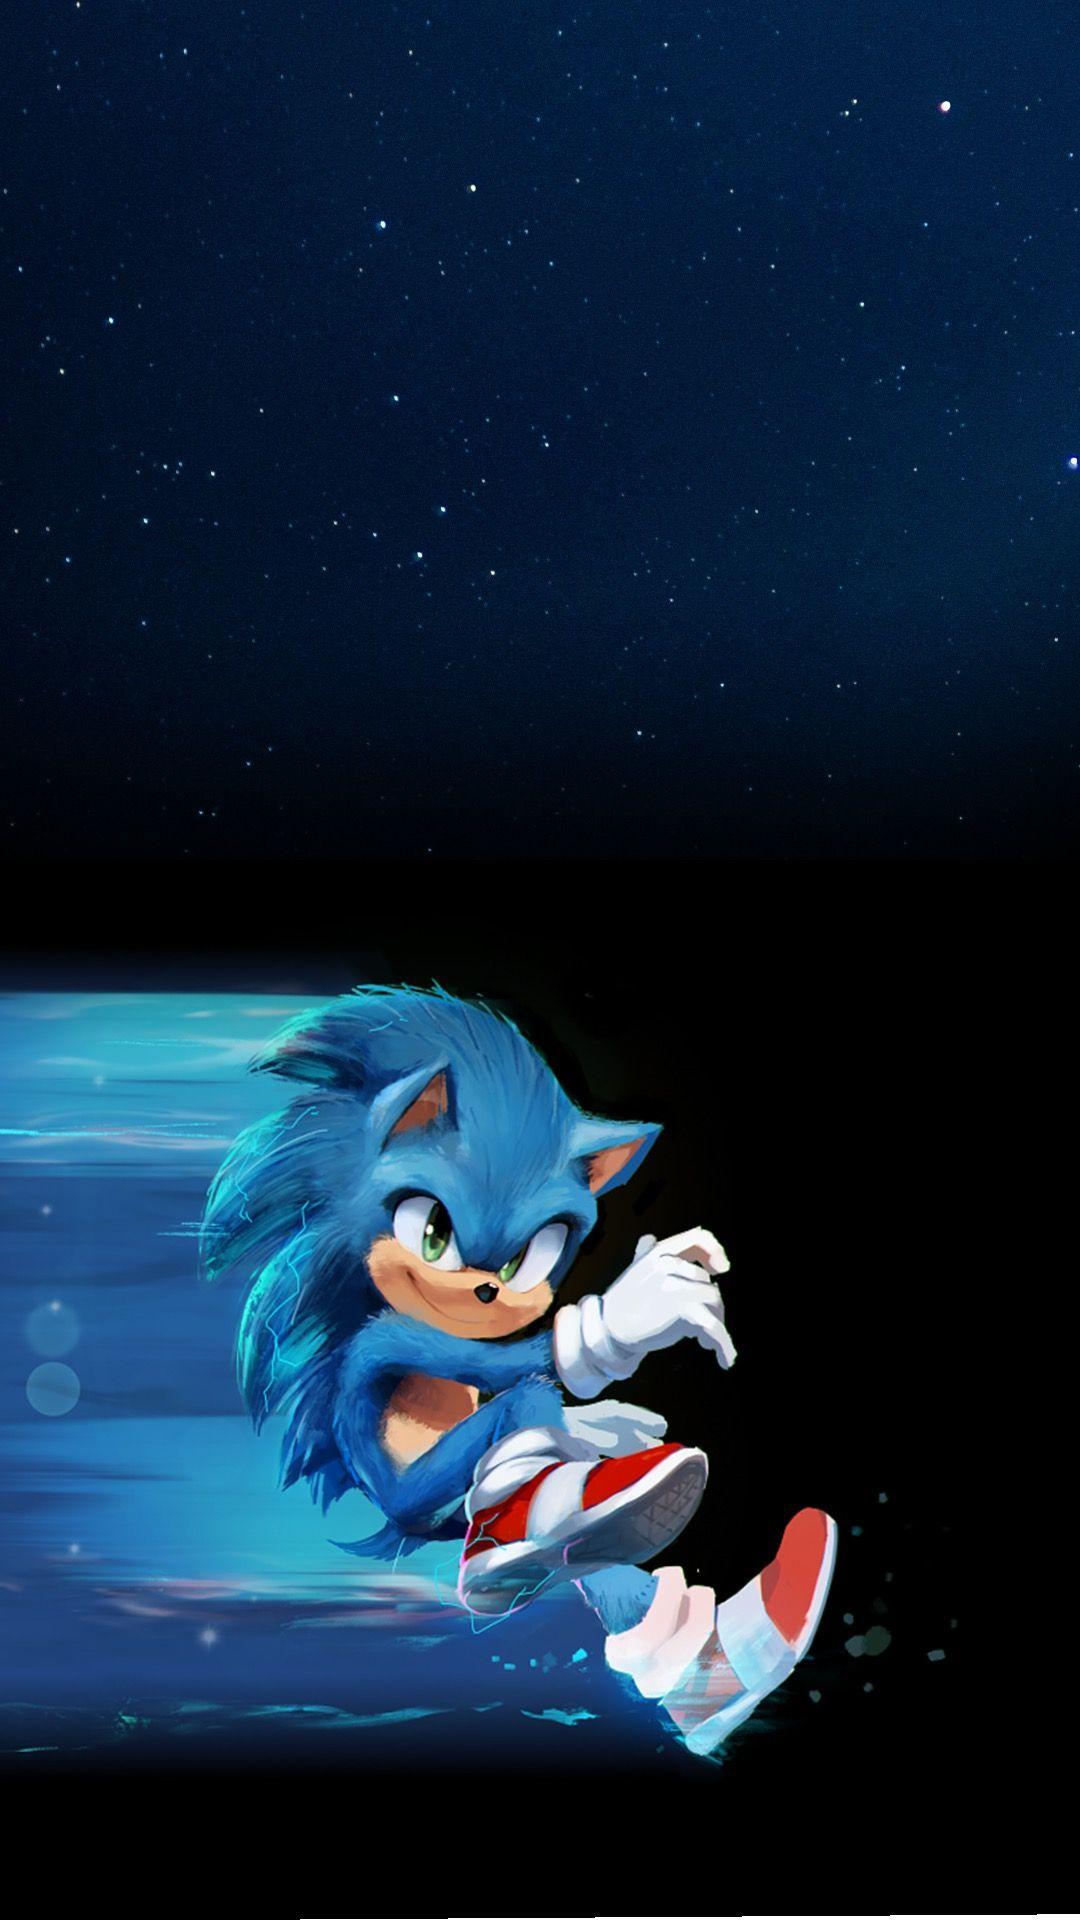 iphone 7 sonic the hedgehog movie wallpaper